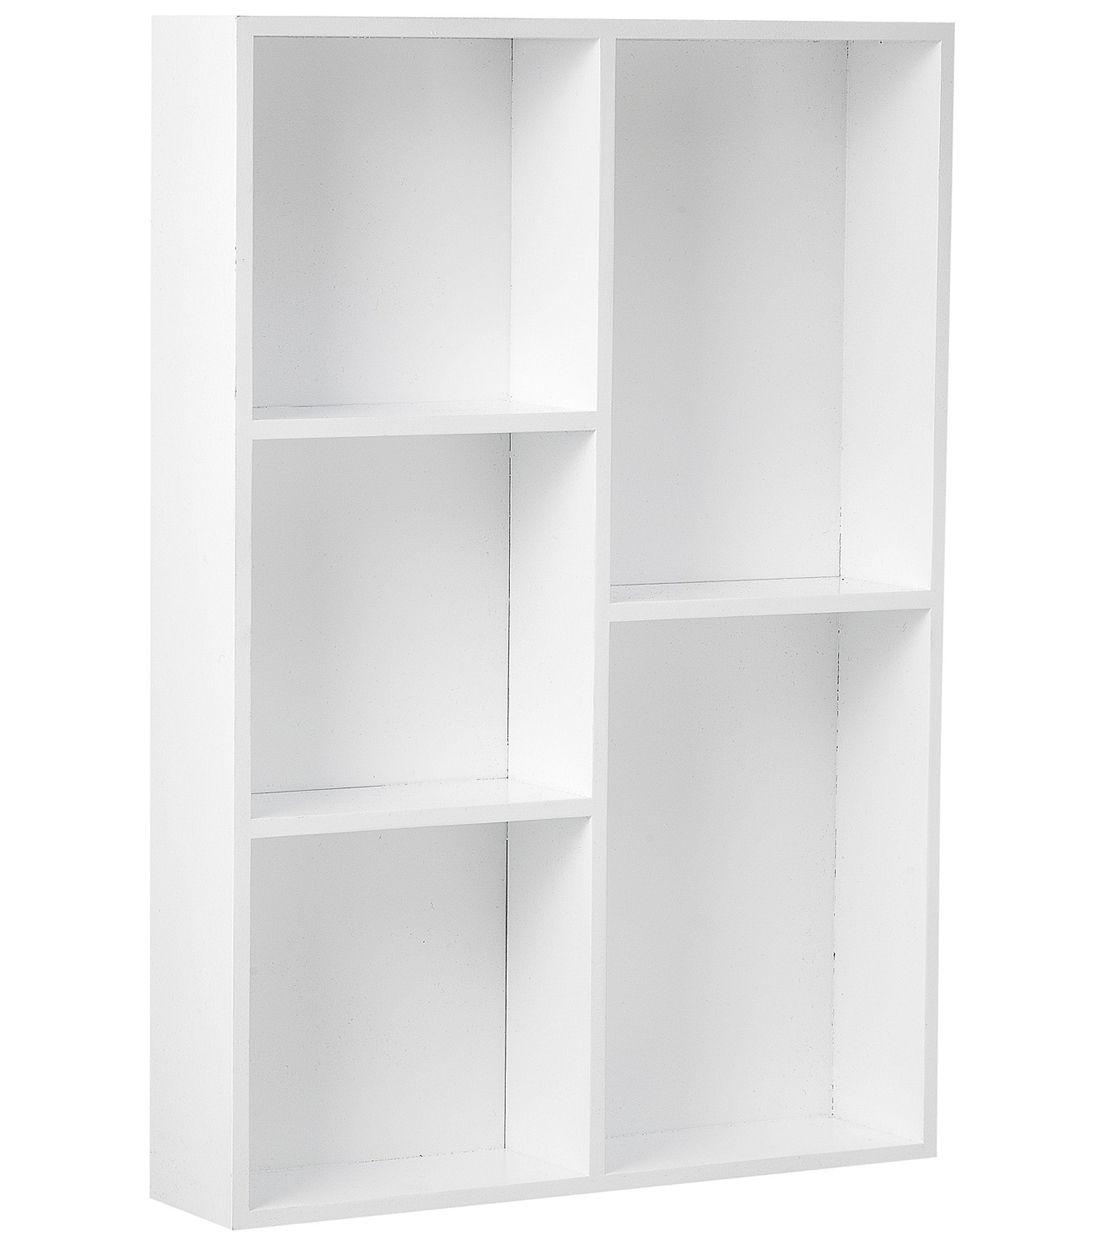 hema 30 rangement vernis pinterest rangement vernis presentoir et casier. Black Bedroom Furniture Sets. Home Design Ideas